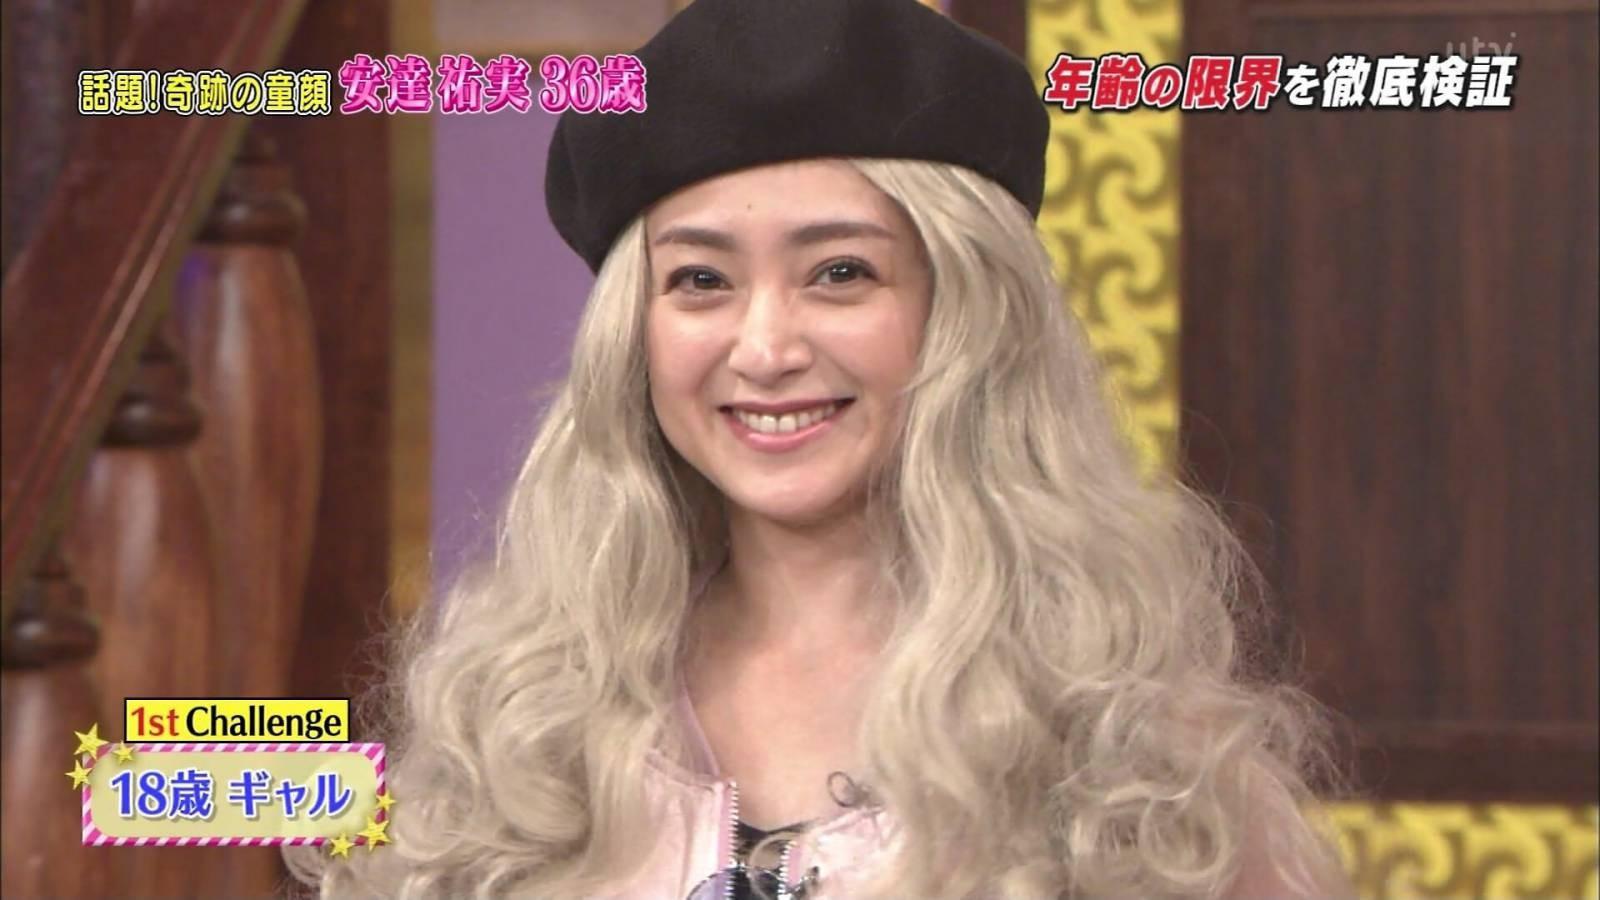 [Good news] Yumi Adachi (36) It's too cute